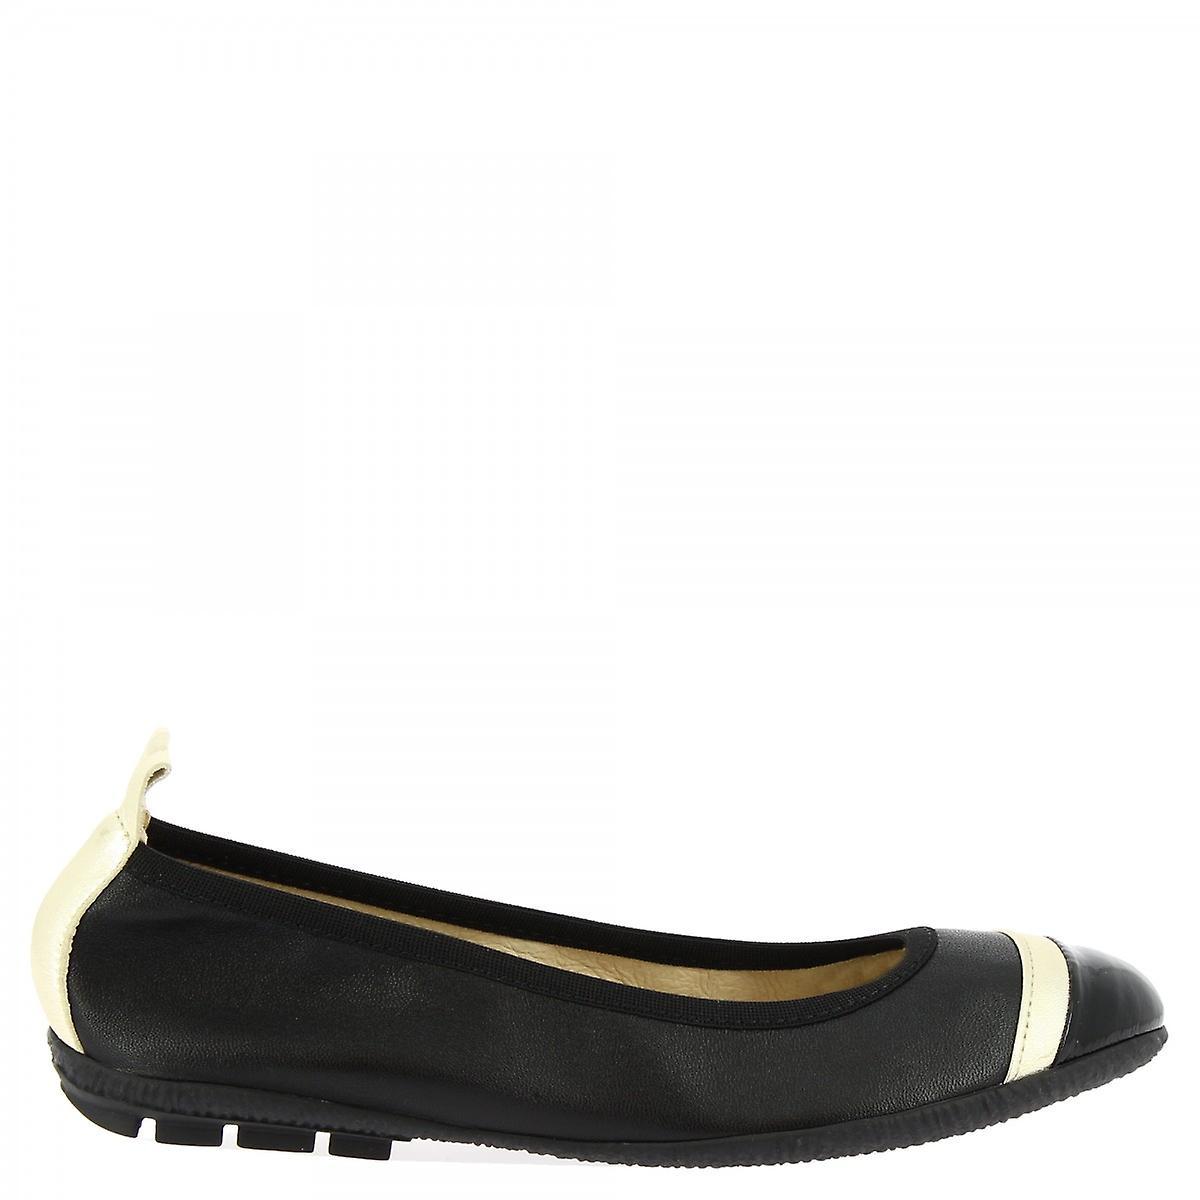 Leonardo Shoes Women's Handmade Ballet Flats Black Napa Leather White Band